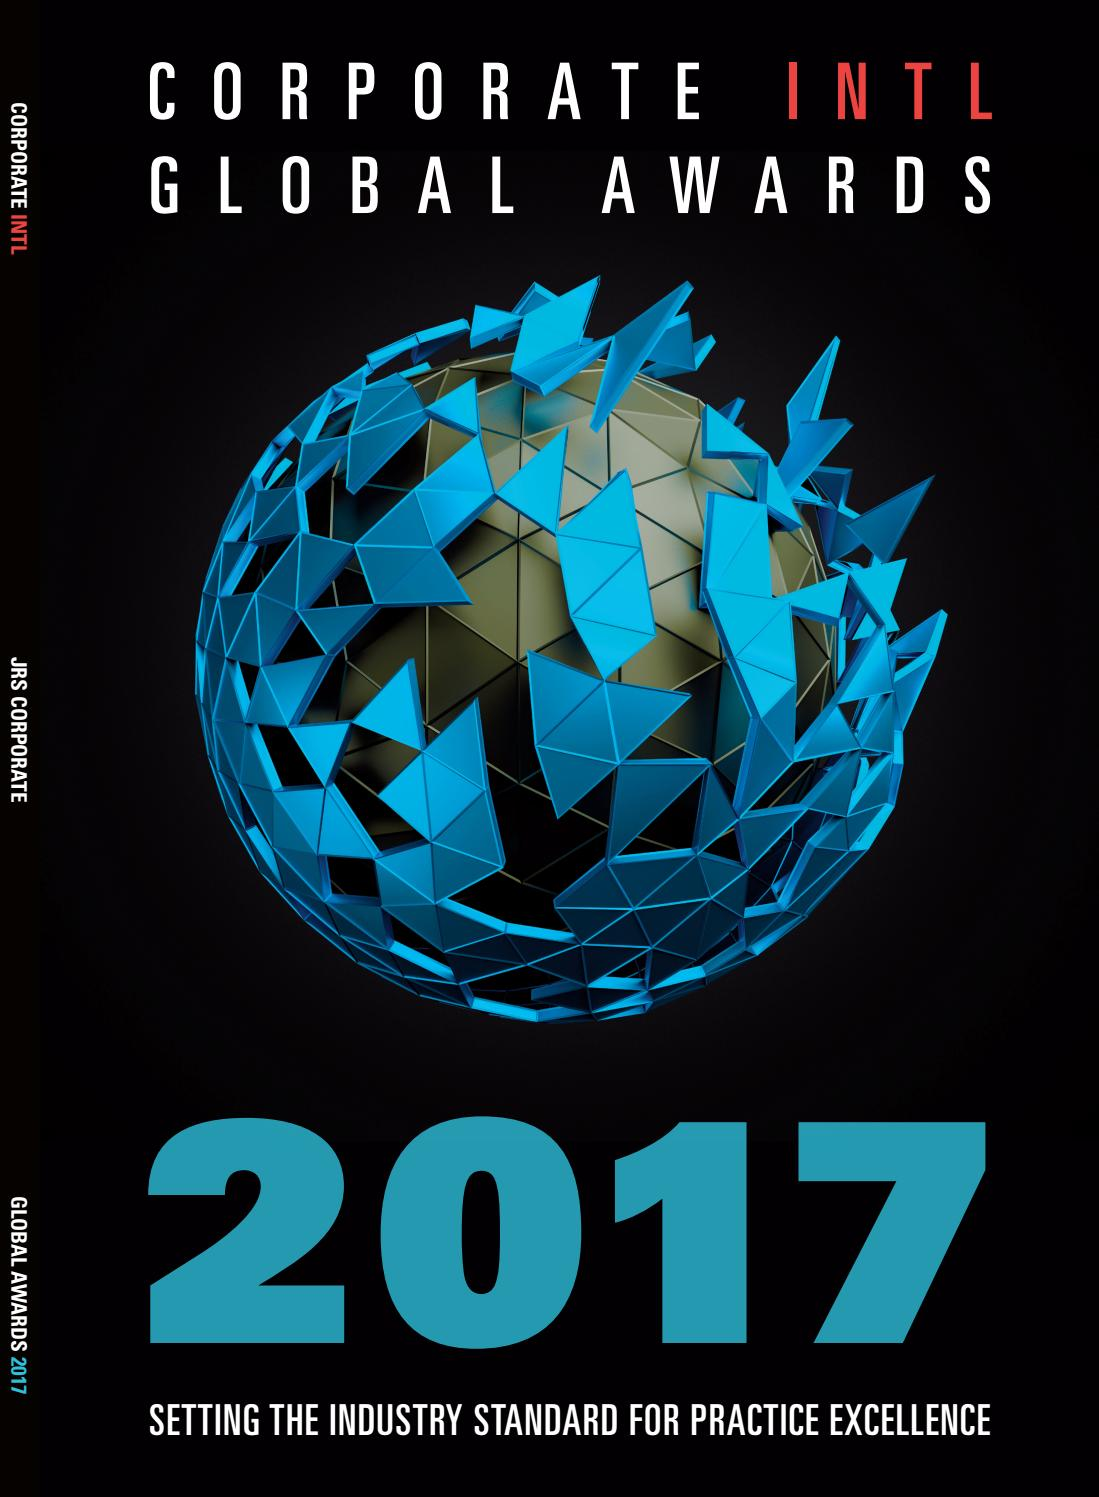 Corporate INTL Global Awards 2017 by Jrs Corporate Ltd - issuu